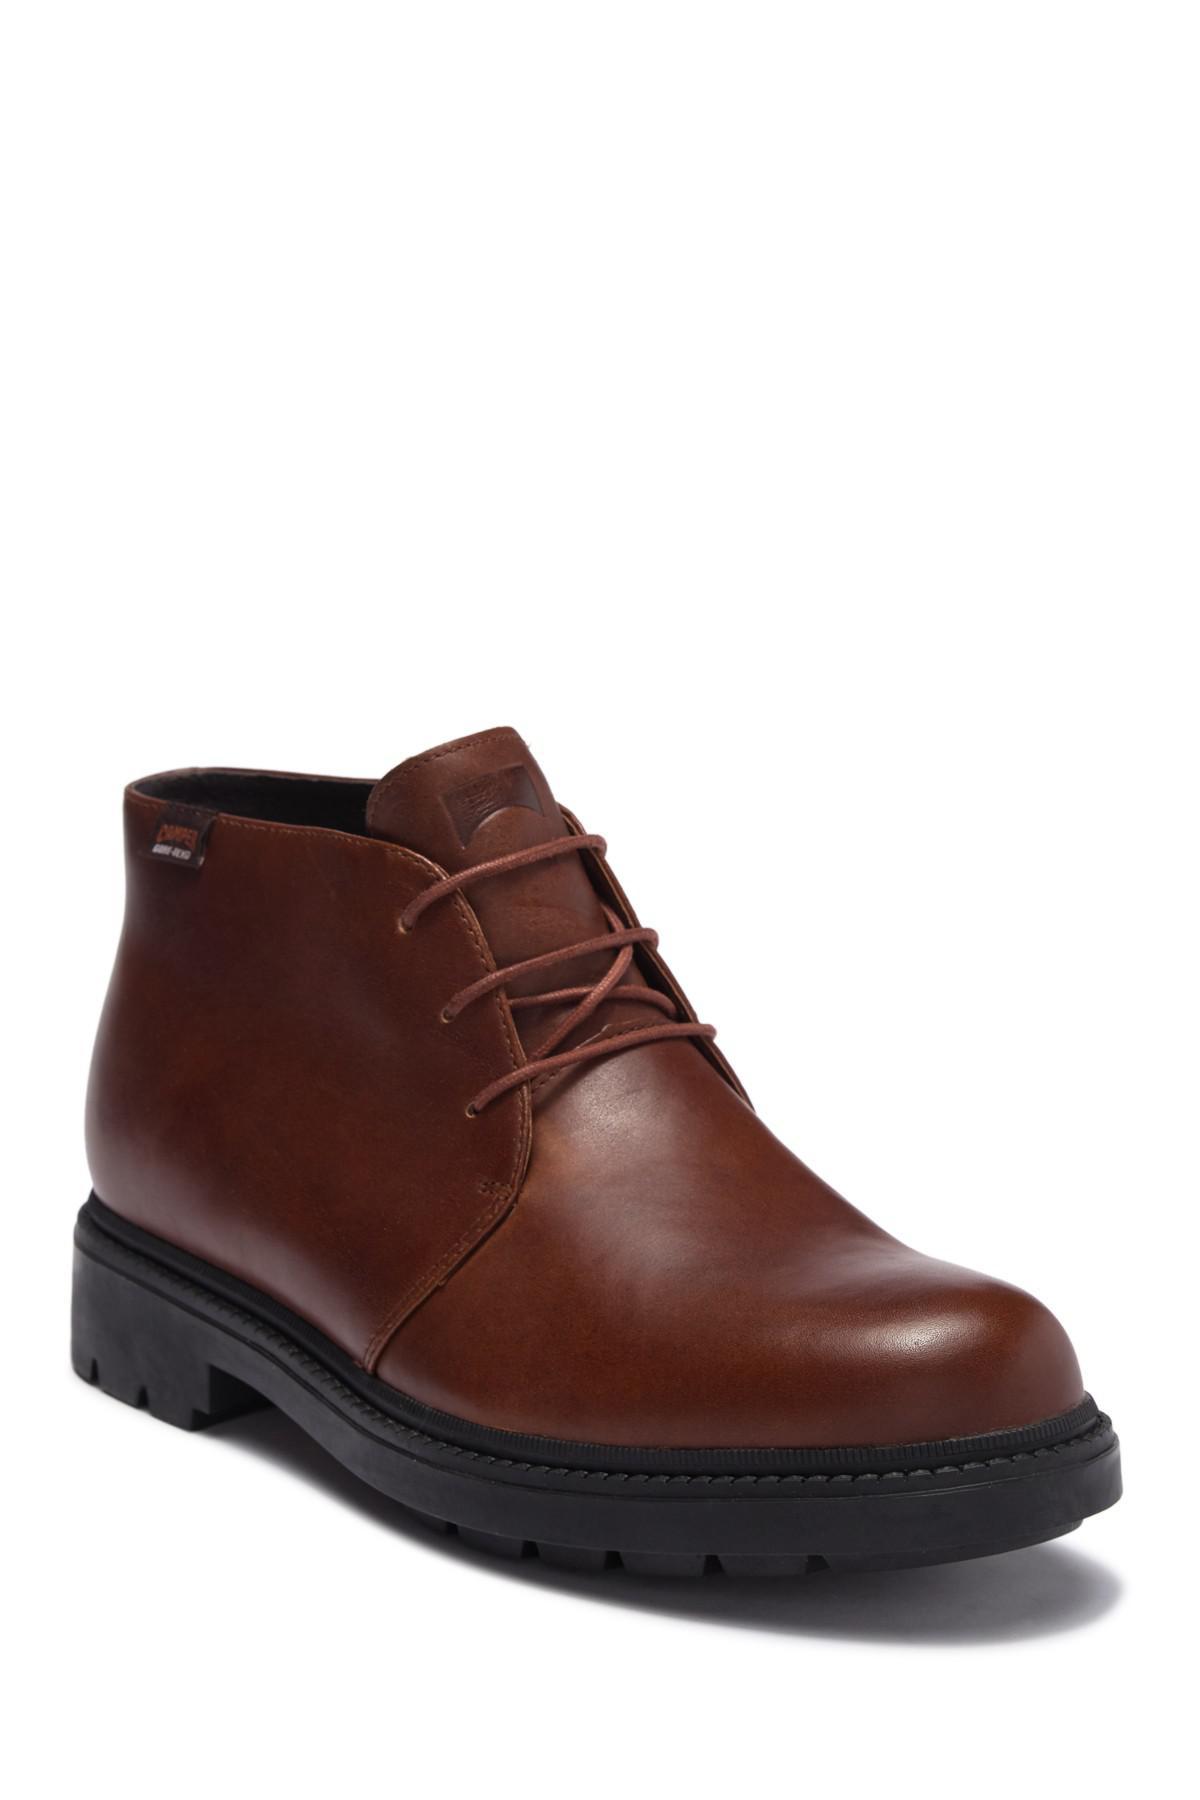 CAMPER Hardwood Leather Chukka Boot TZEt4qw13Q